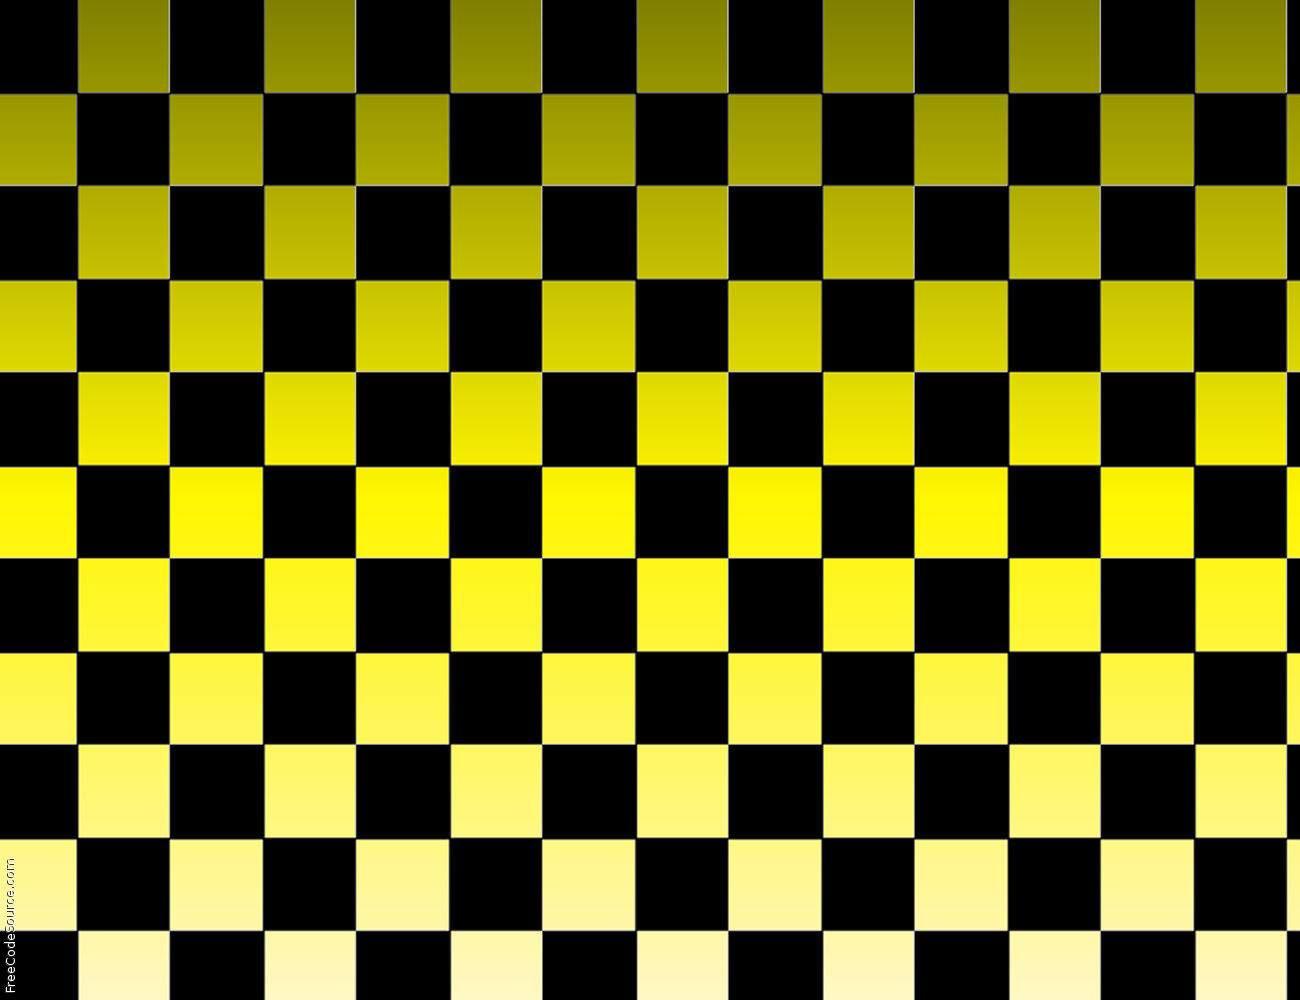 Black And Yellow Wallpaper 24 Hd Wallpaper. Small Narrow Kitchen Design. Best Design For Kitchen. Contemporary Kitchens Designs. Curved Island Kitchen Designs. Kitchen Cabinet Design Software Free Download. Design Your Kitchen Layout. Cad Kitchen Design. Kitchen Design.com